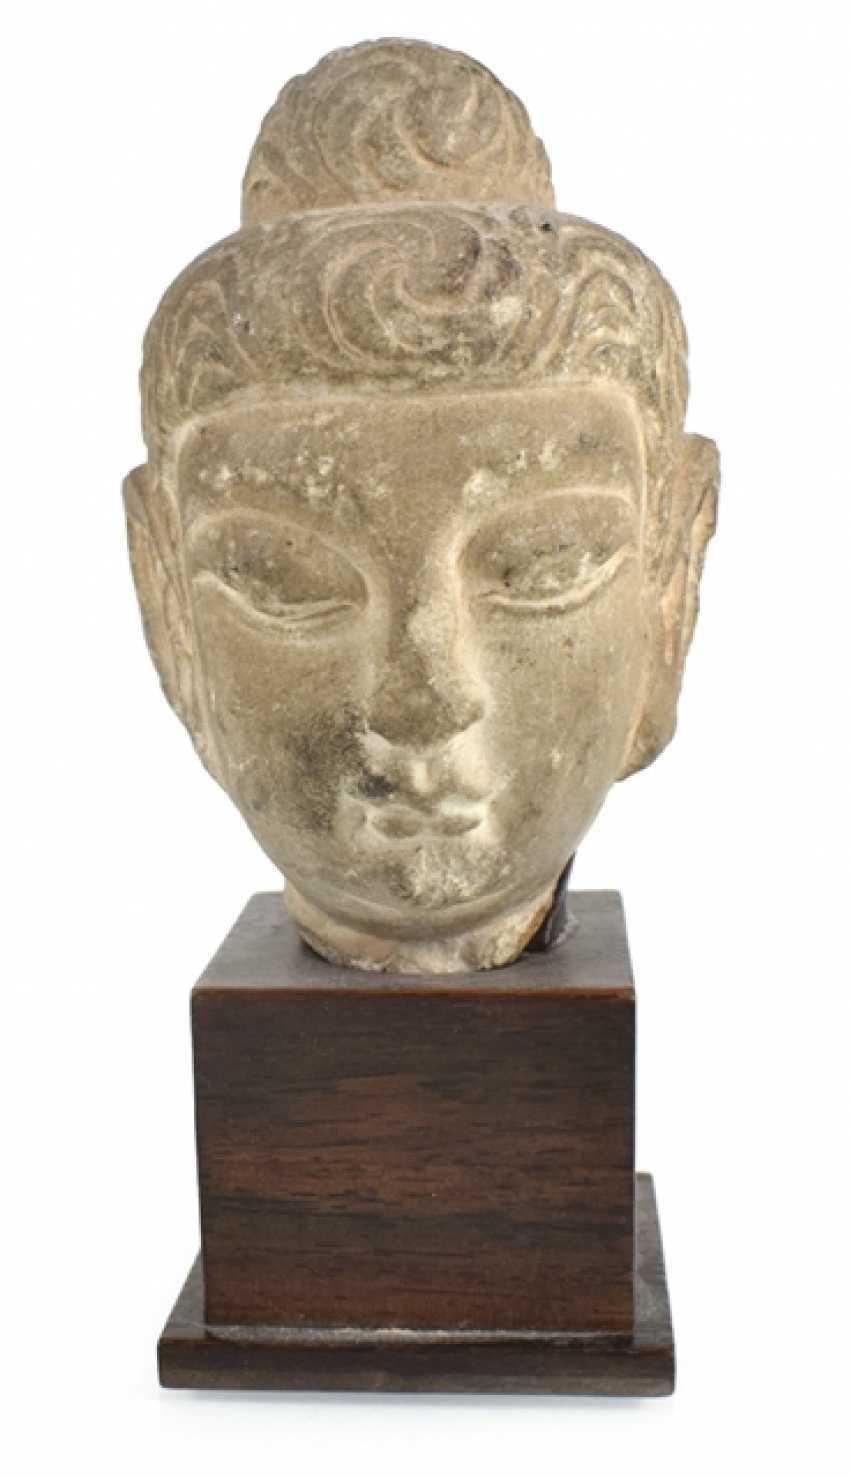 Stone head of Buddha on a wooden base - photo 1